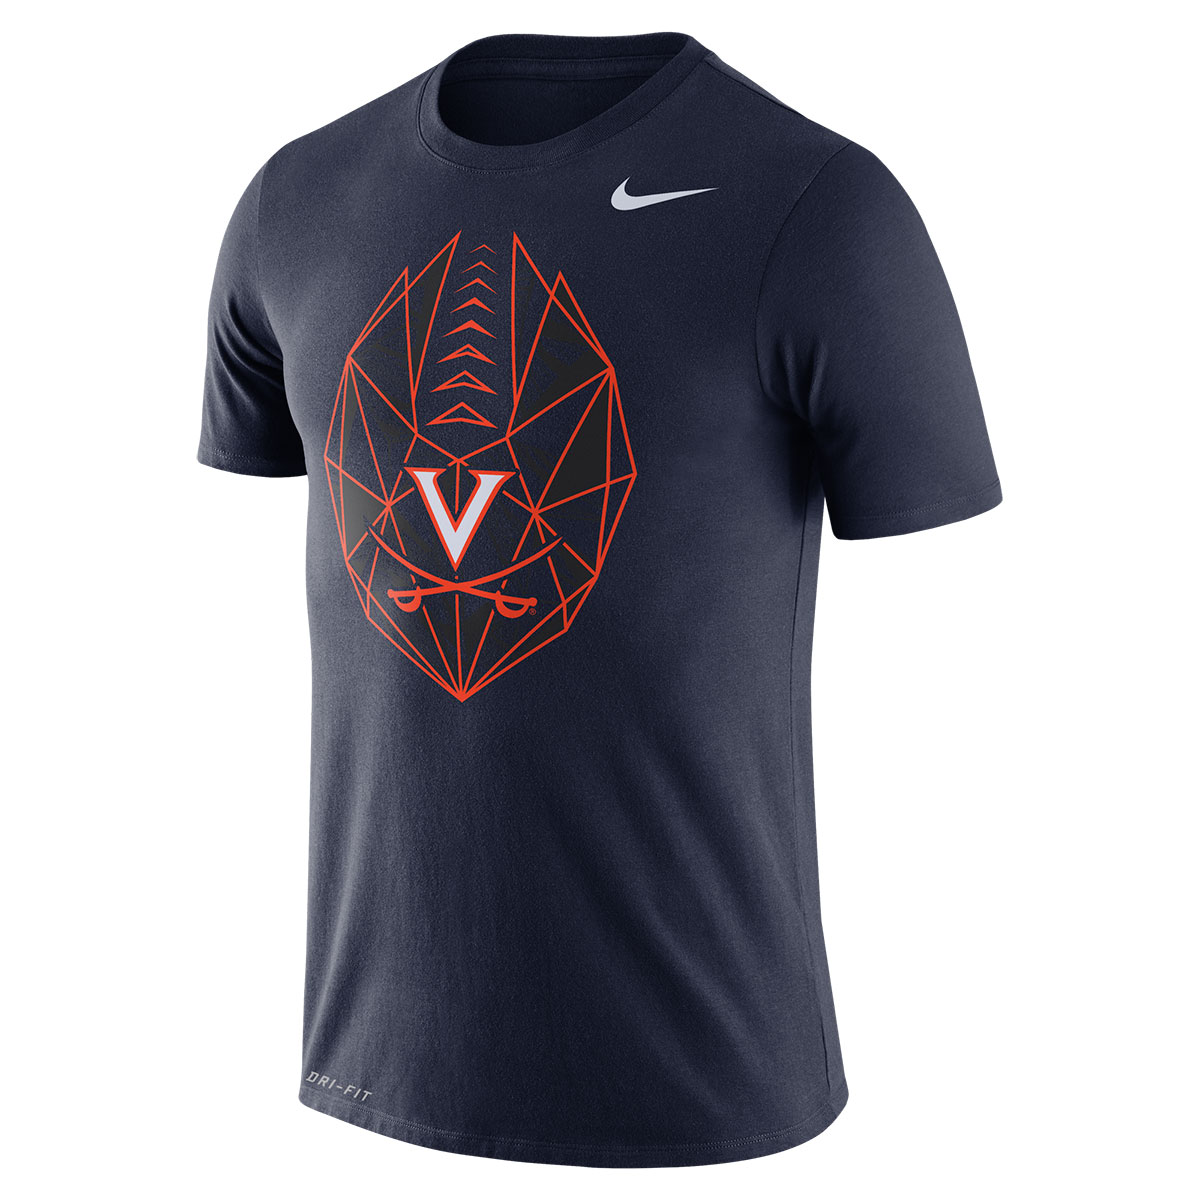 University of Virginia Nike T-Shirt